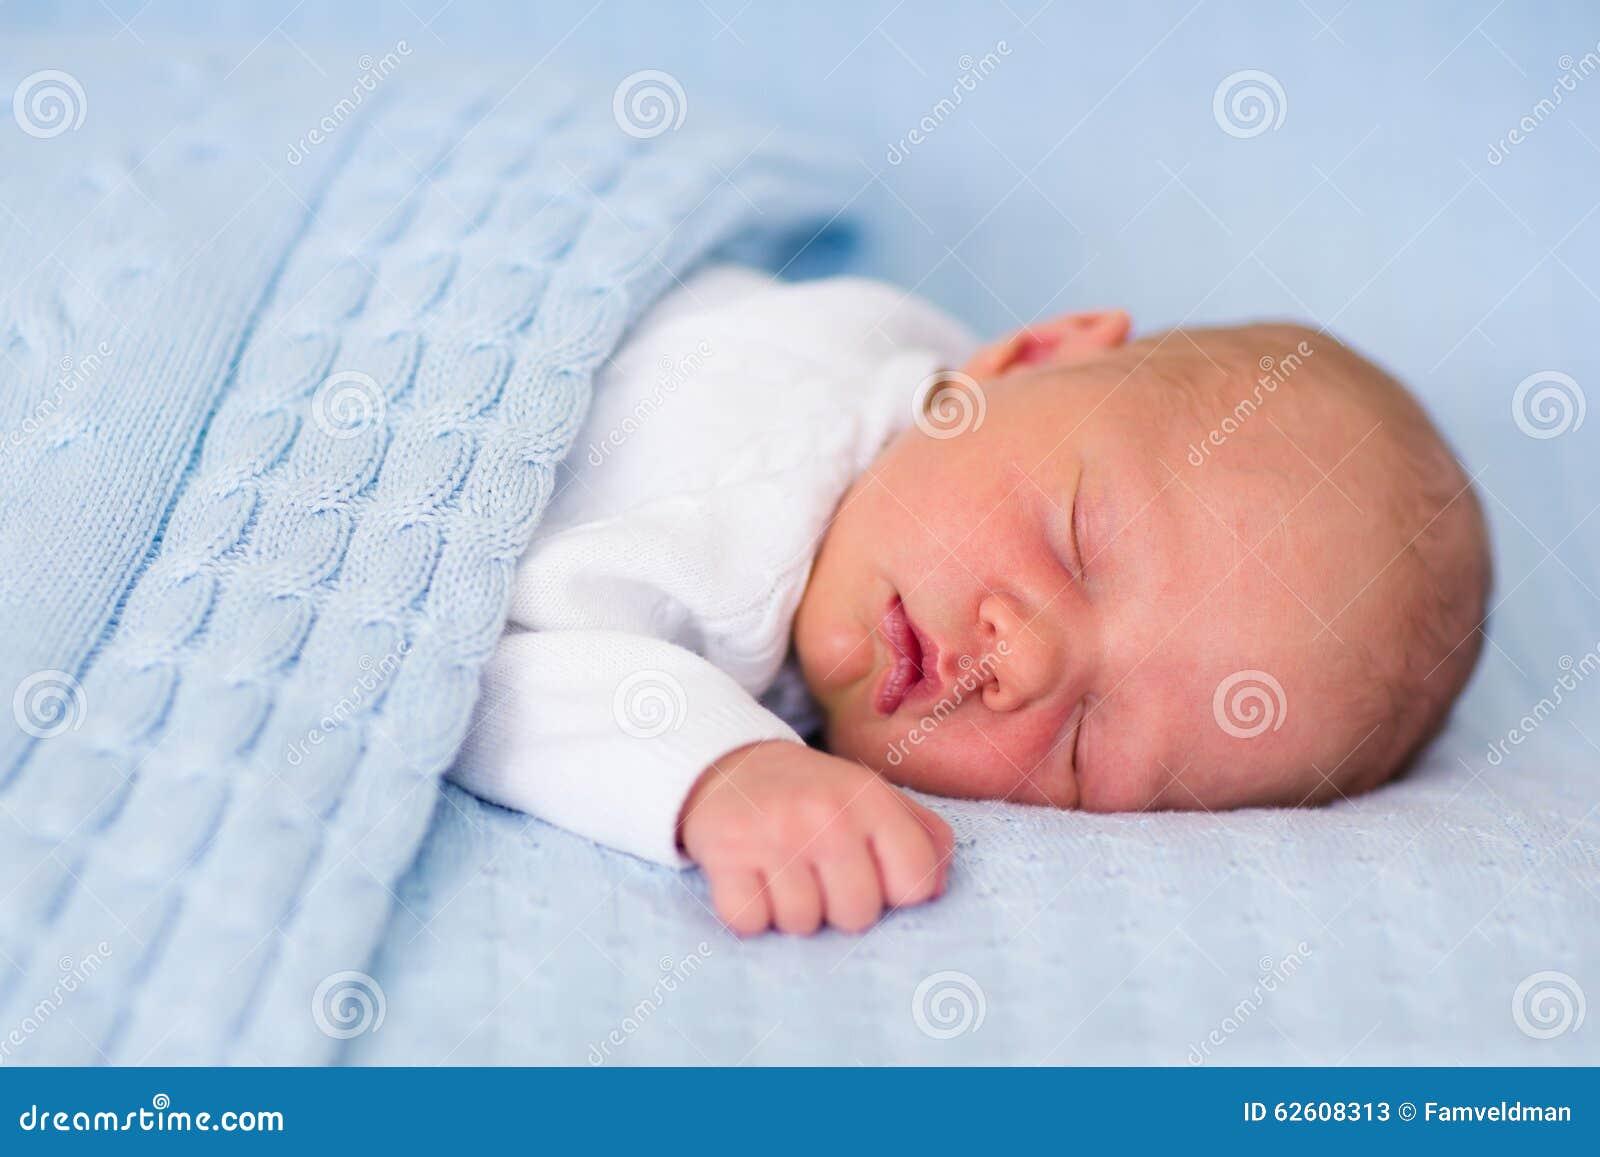 2c35995aab8b Newborn Baby Boy On A Blue Blanket Stock Image - Image of little ...